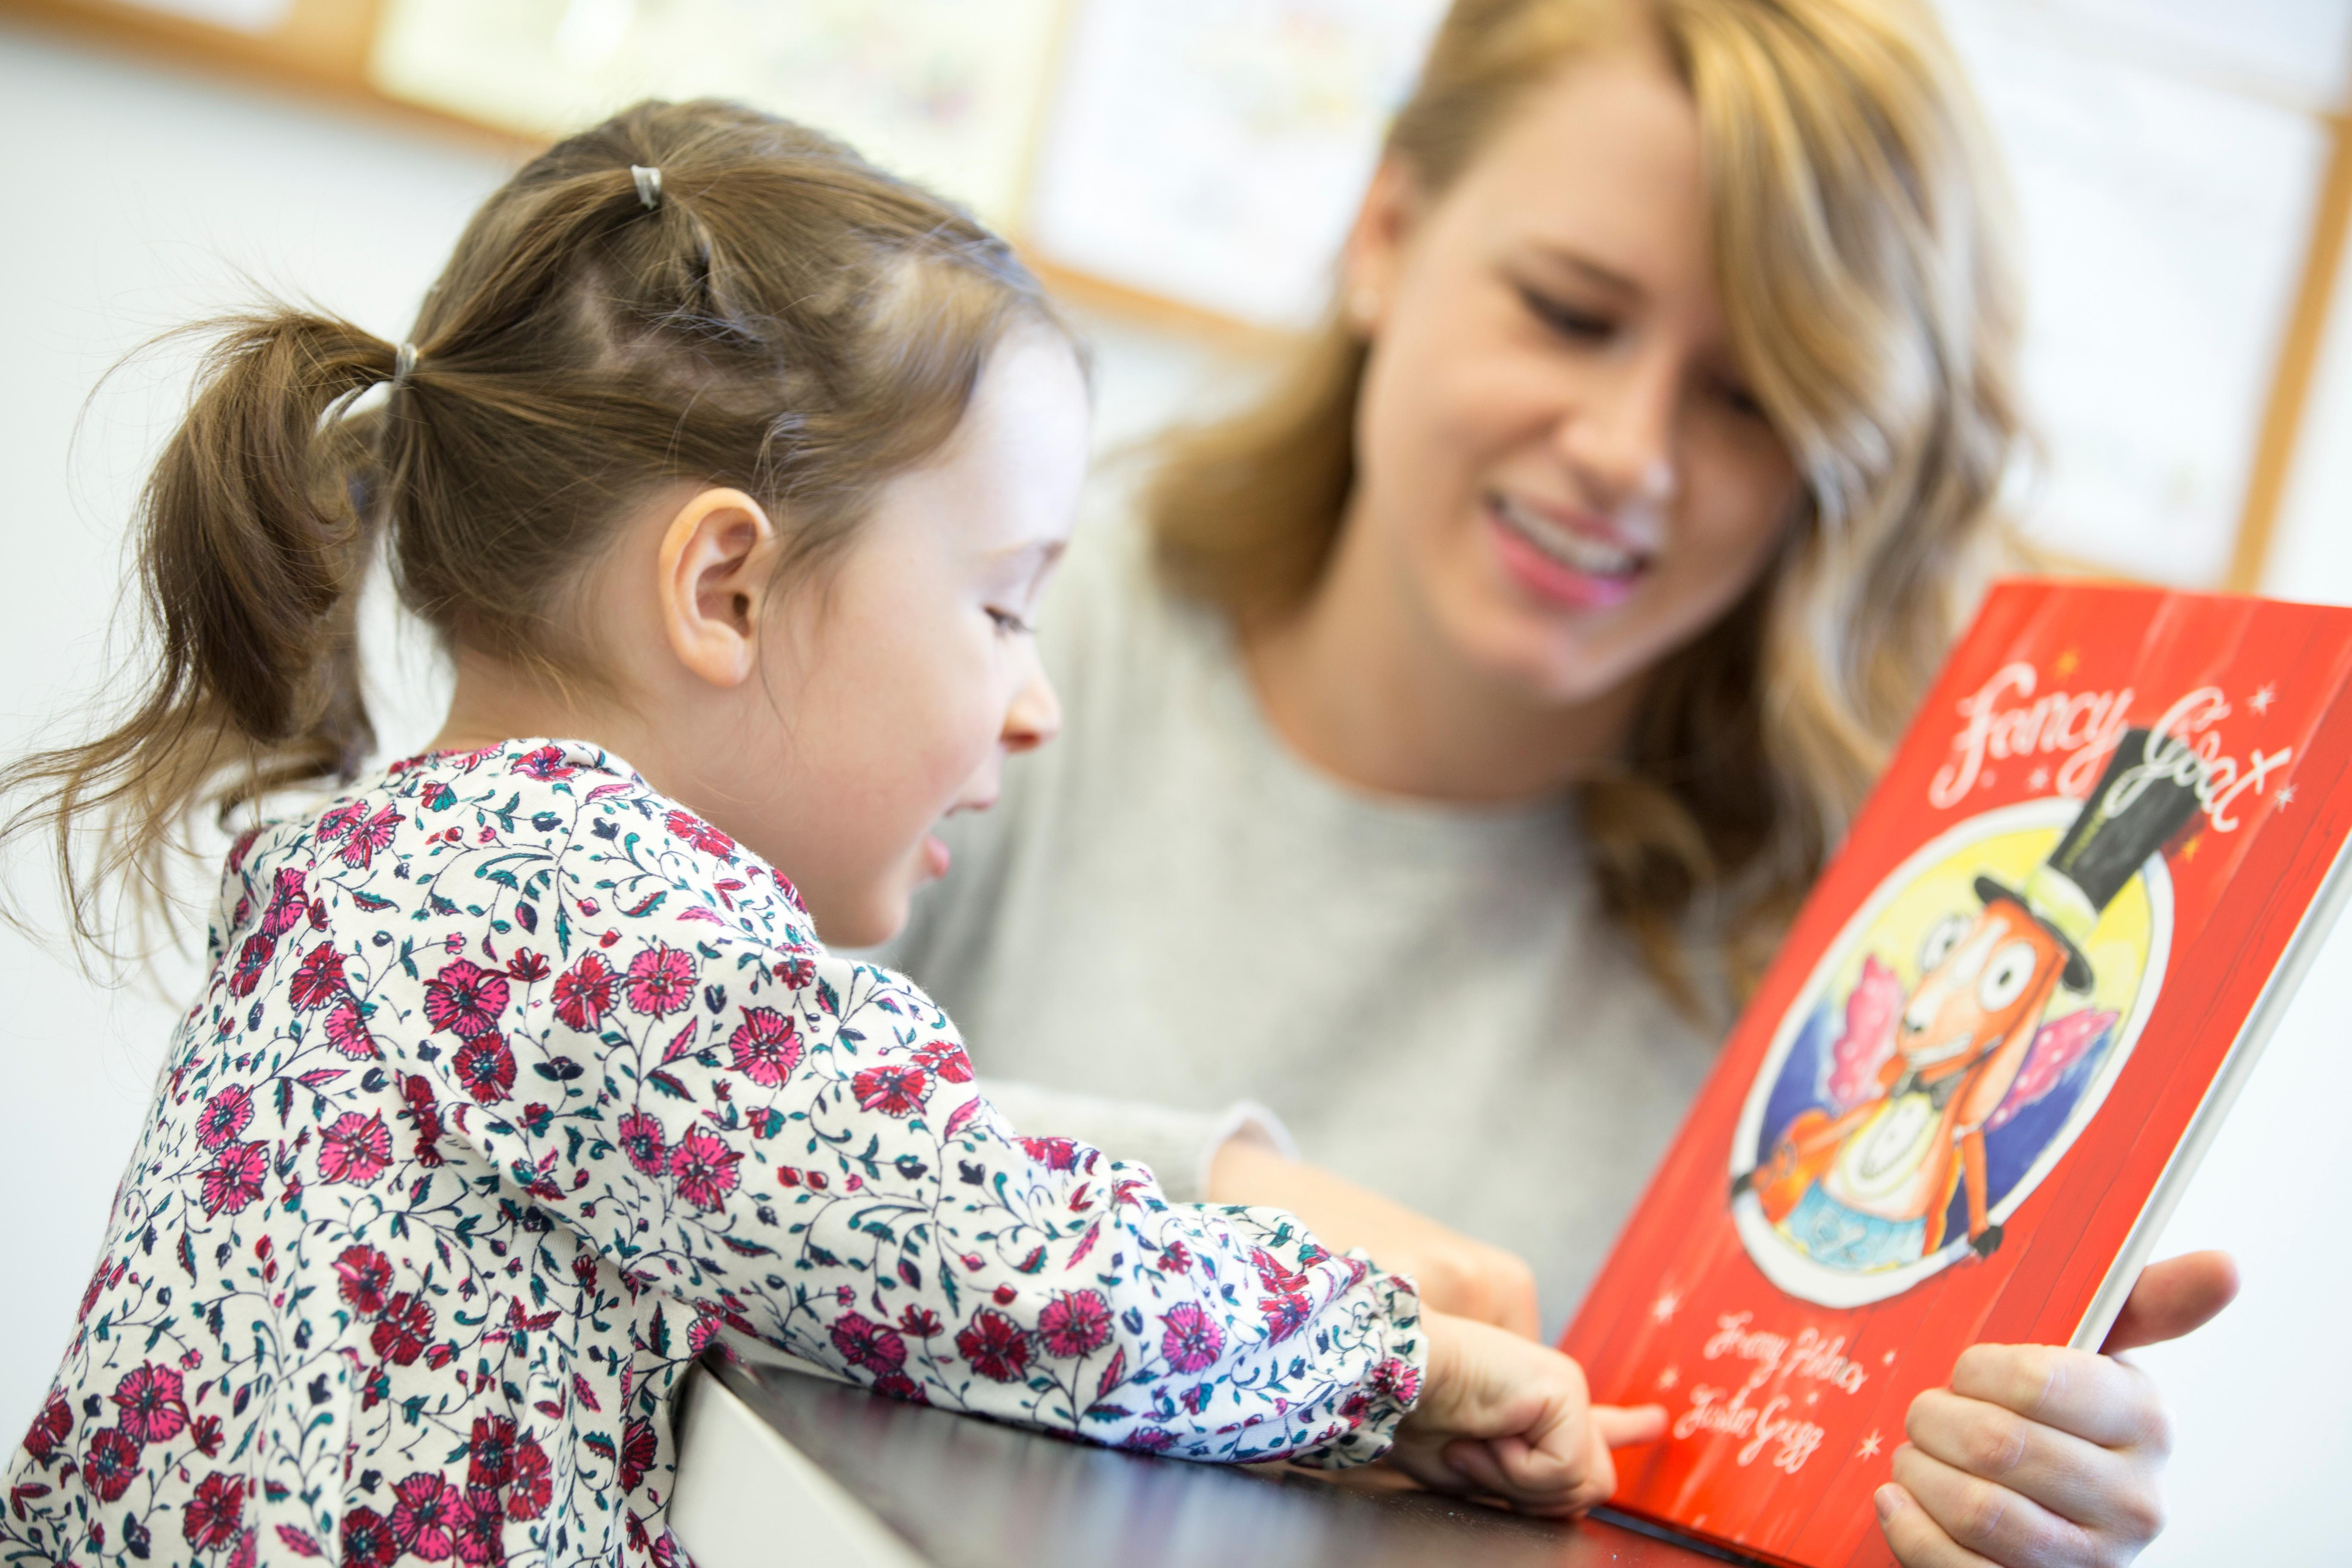 halifax learning reading program reading support literacy education read write spell learn evidence-based tutor tutoring